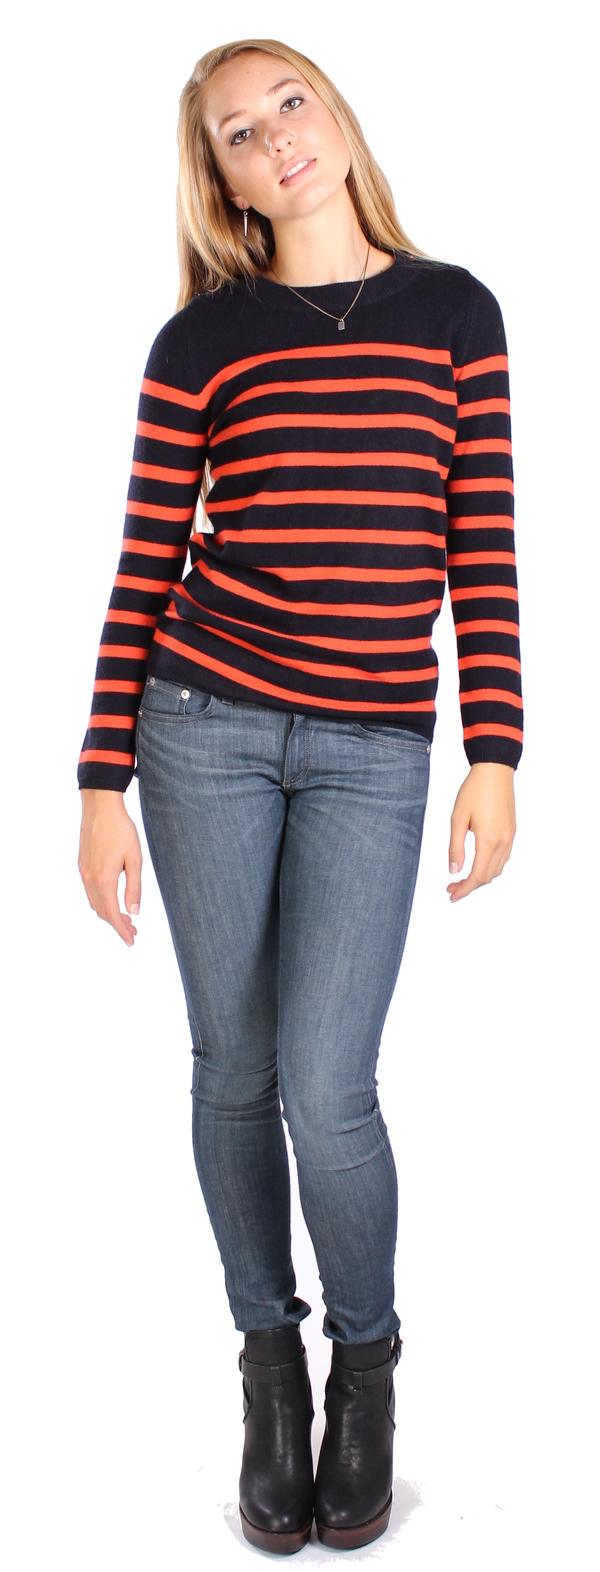 Chinti & Parker Guernsey Stripe Sweater